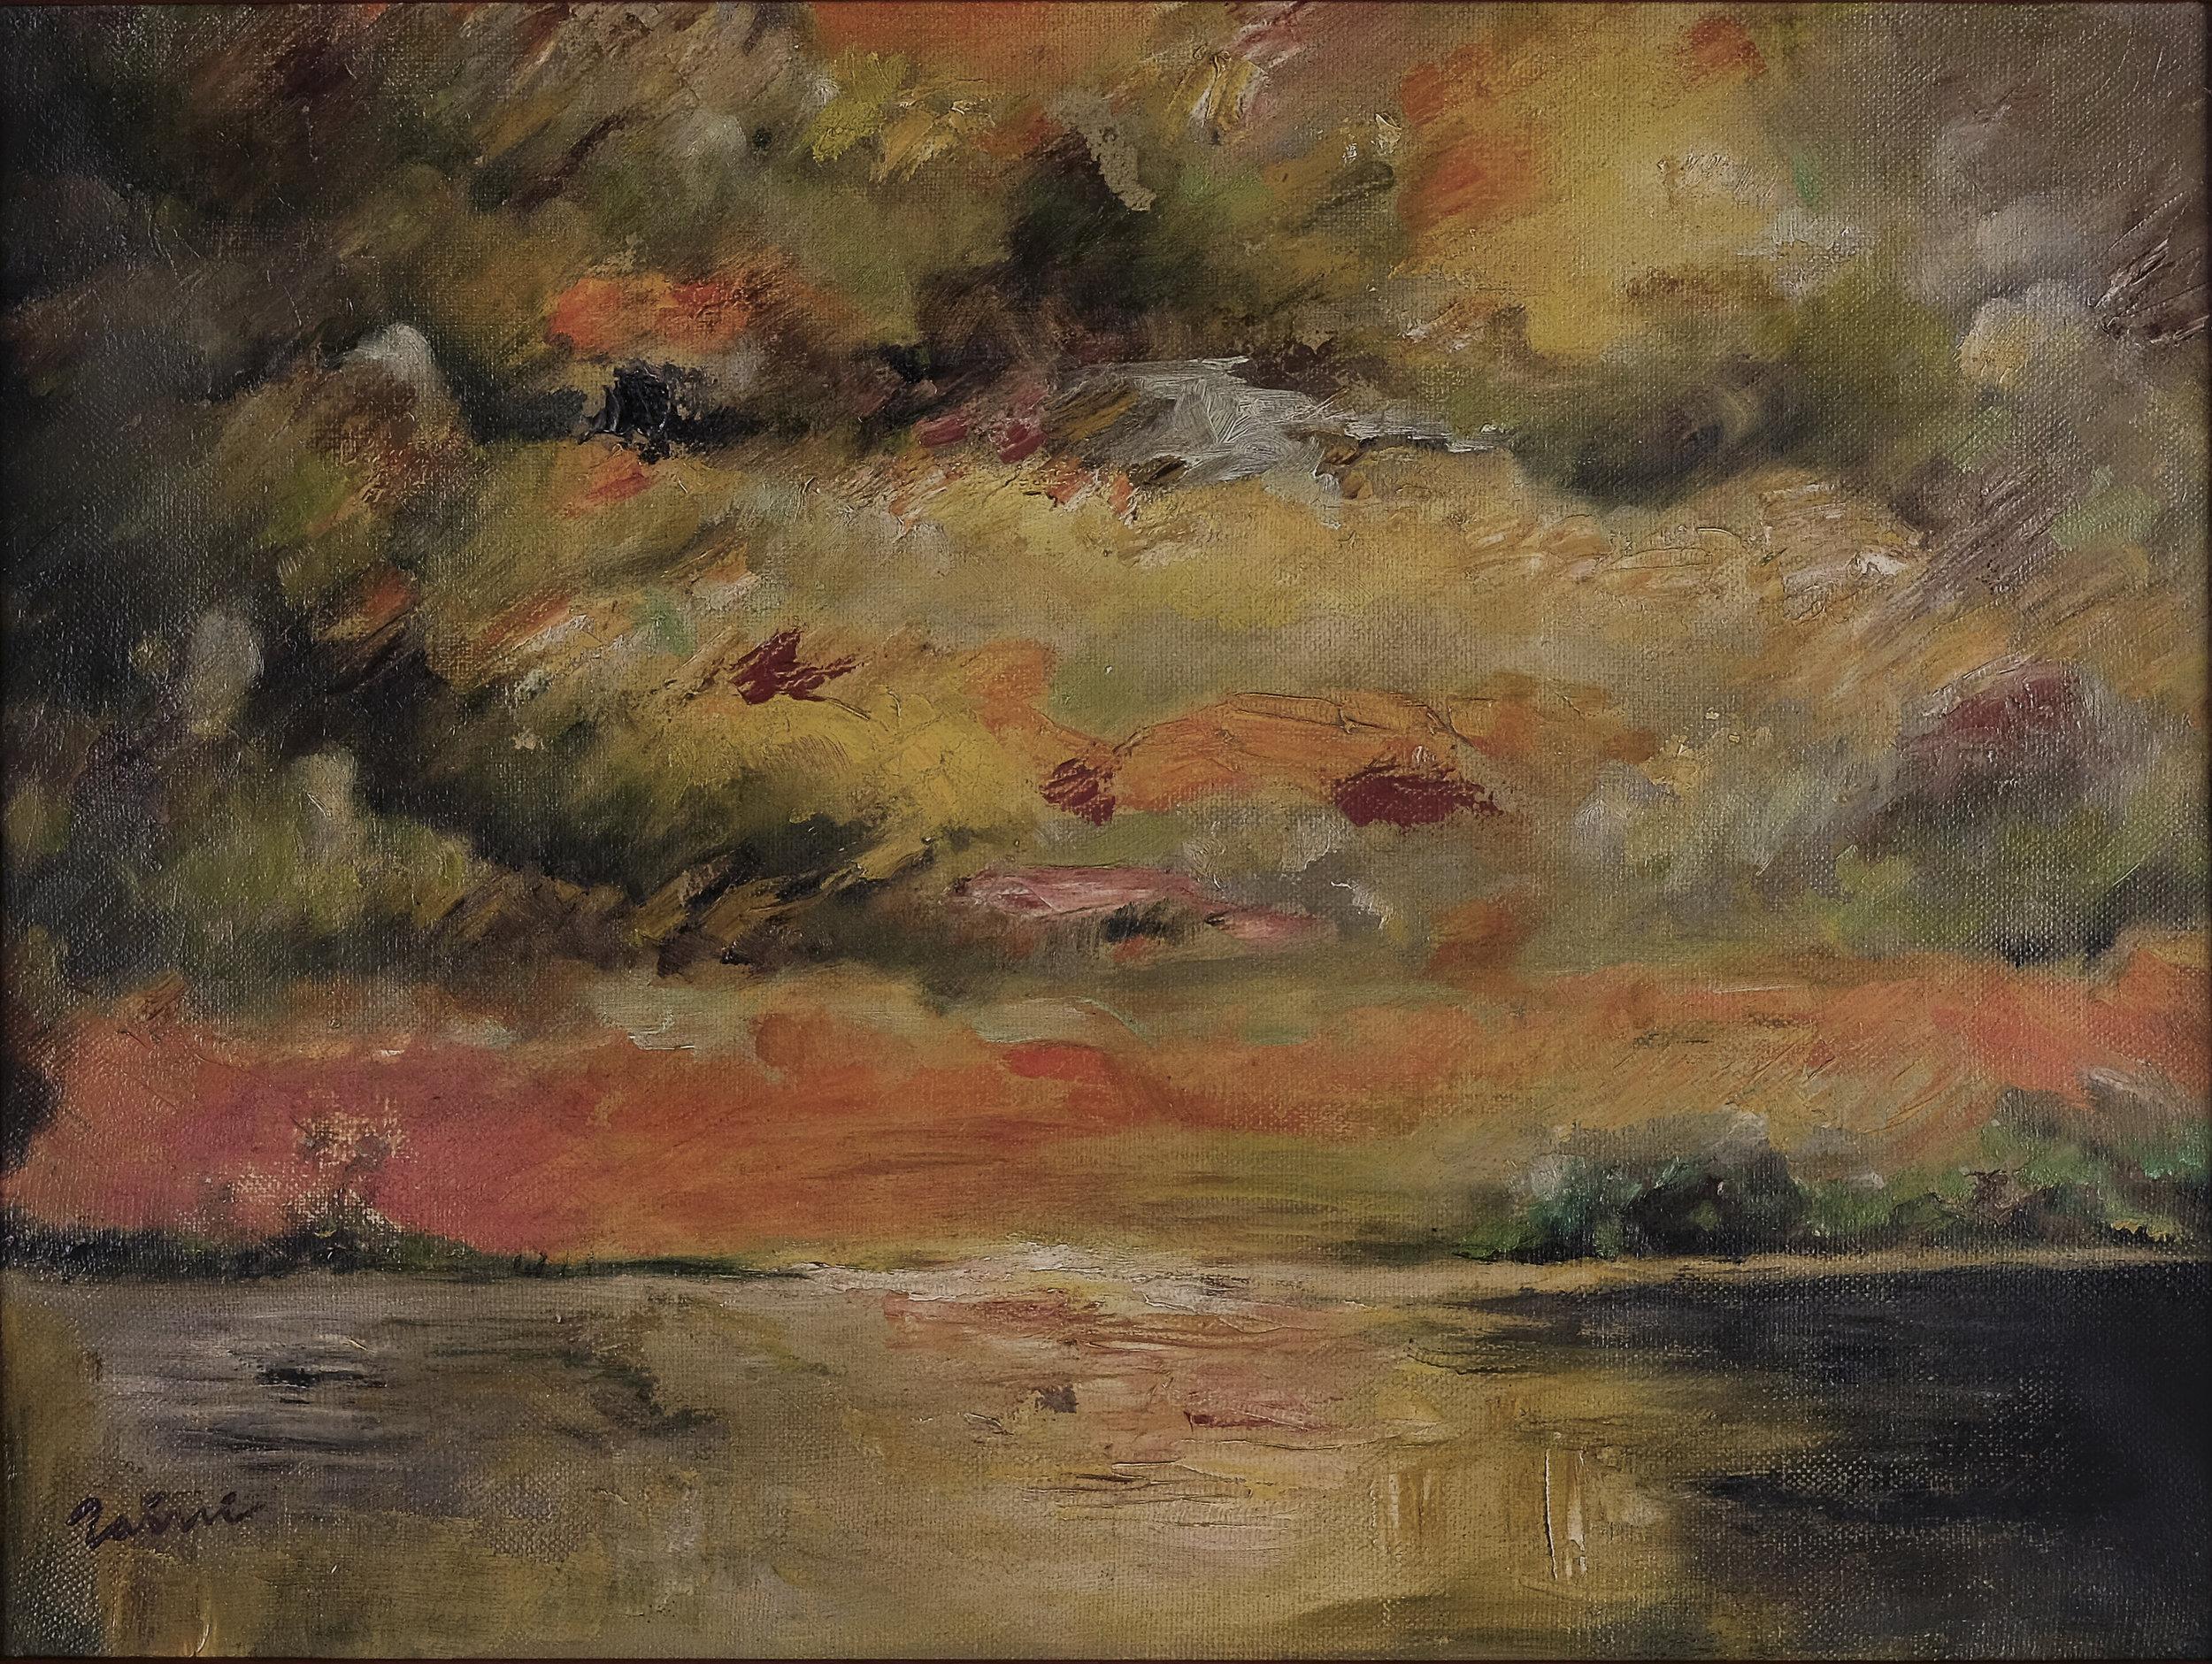 Zaini, Lembayung Senja (Crimson Dusk), oil on canvas, 30 x 40 cm, 1970s